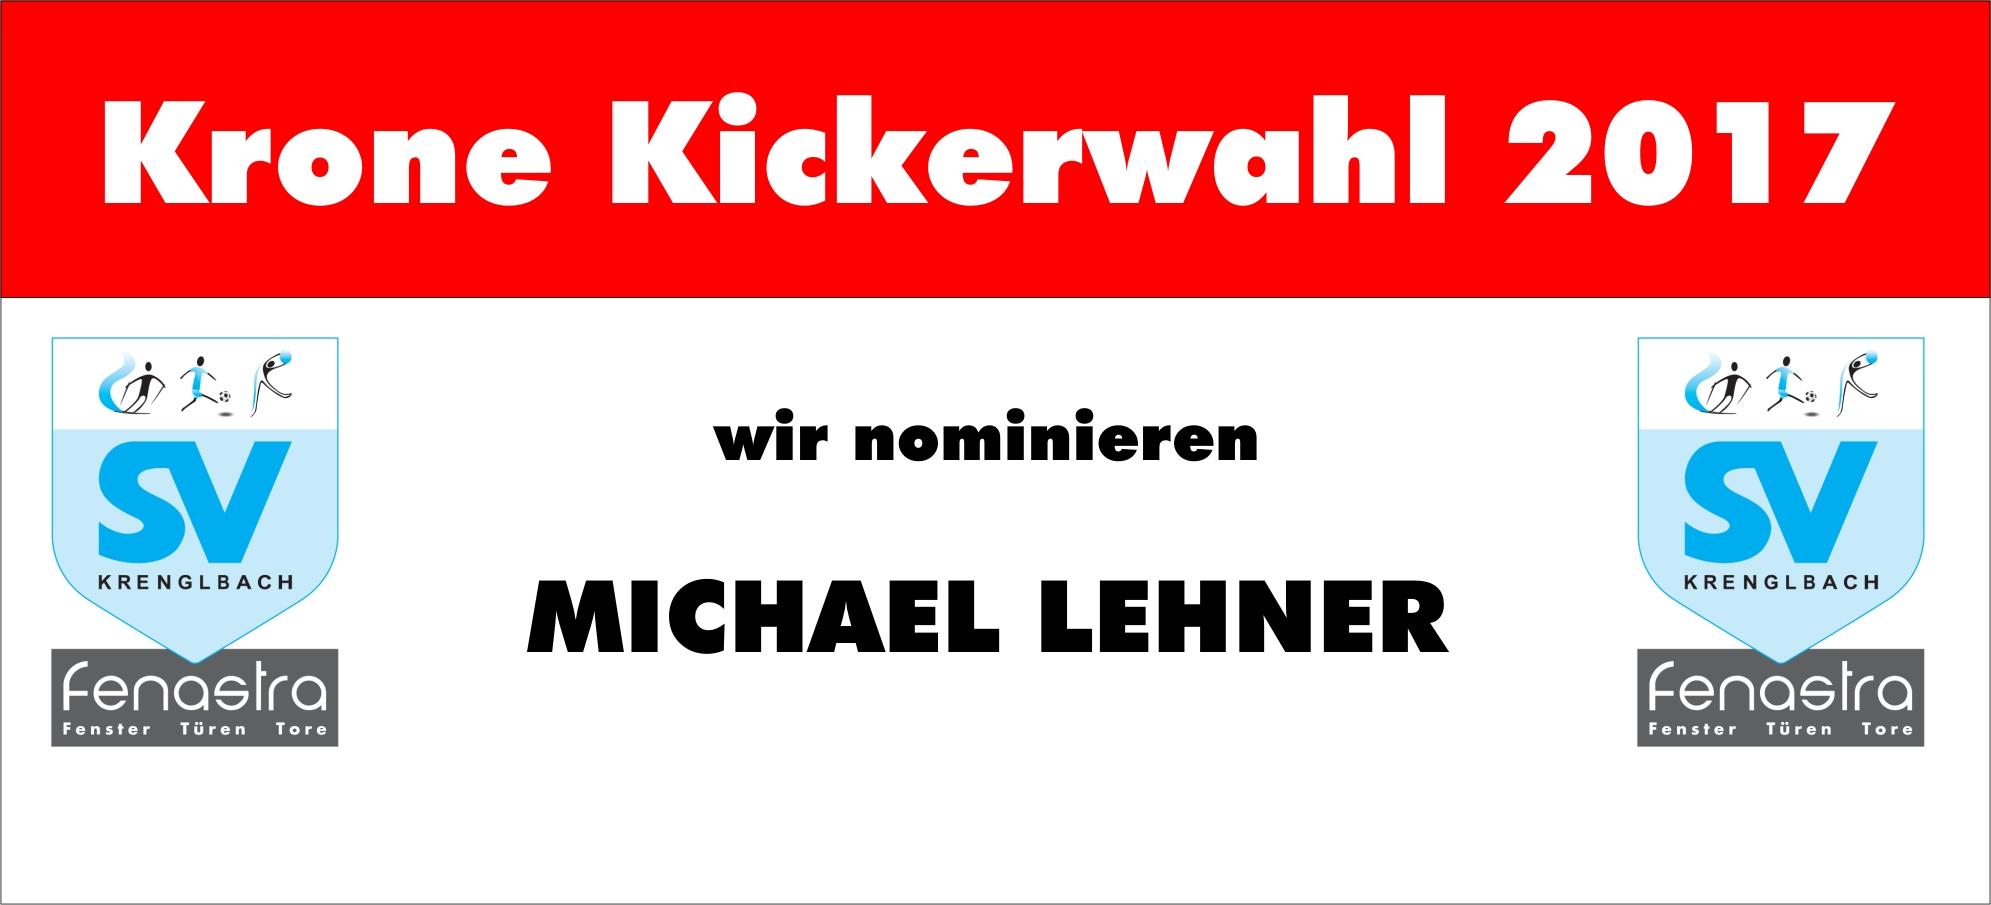 Krone Kickerwahl 2017